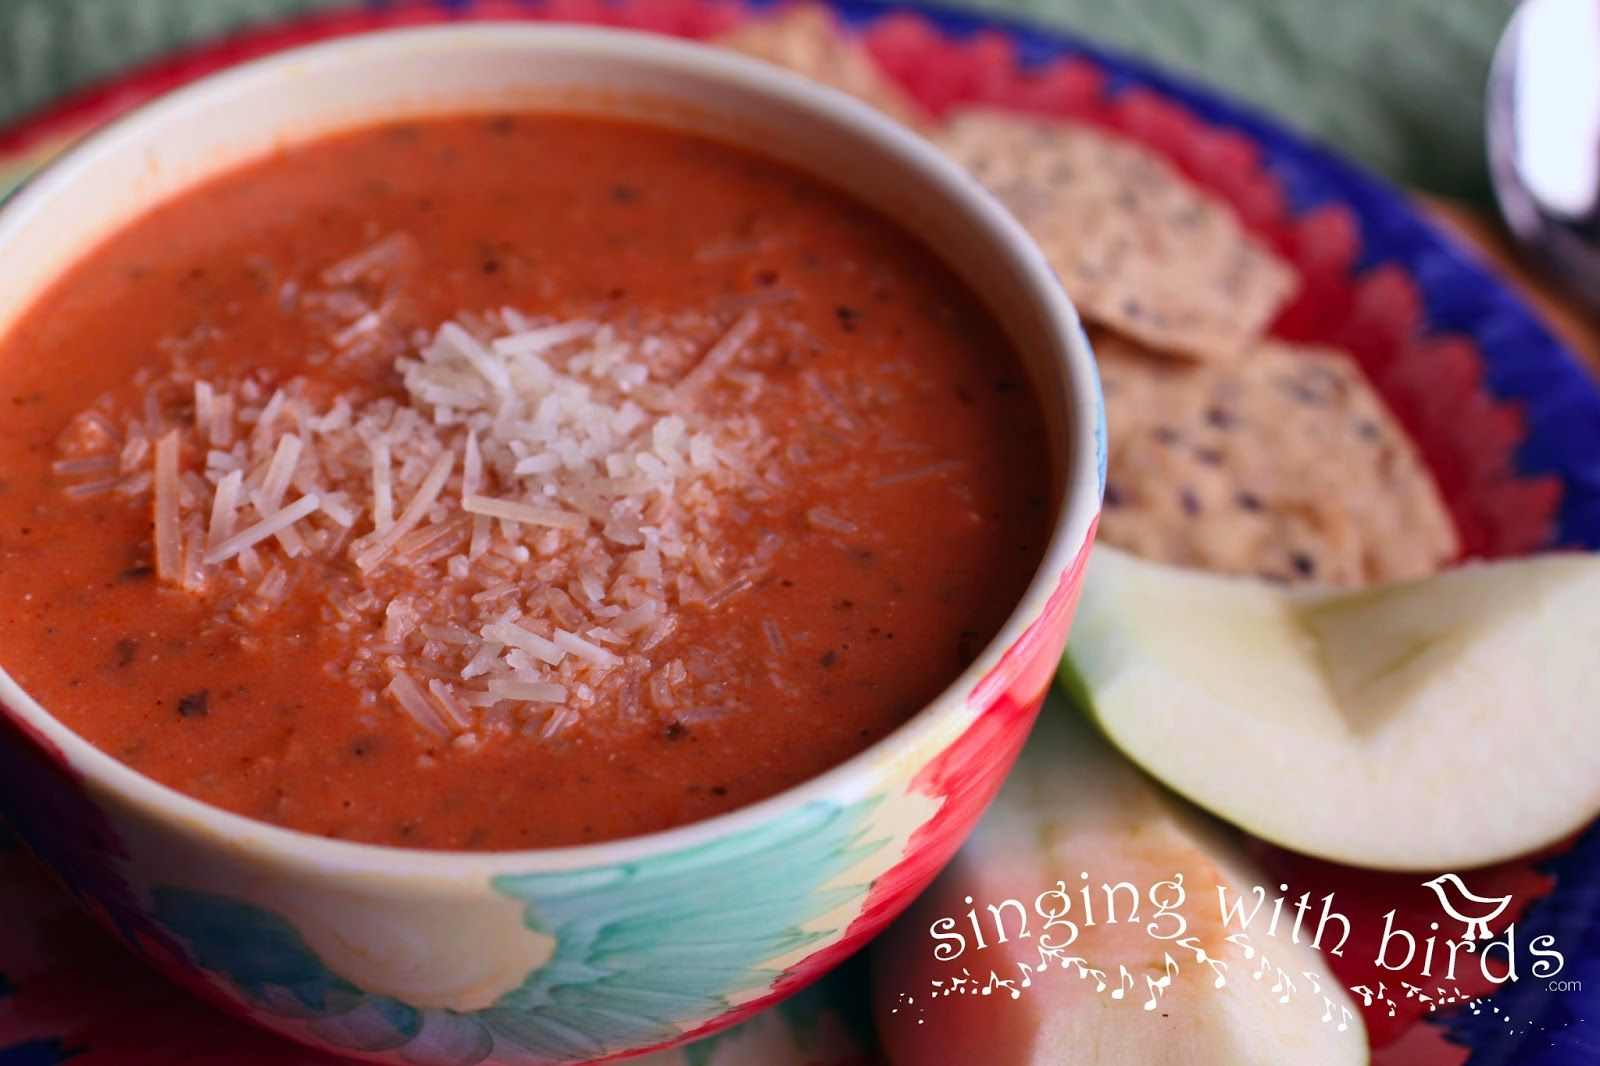 Super Creamy Italian Chili for Superbowl Sunday